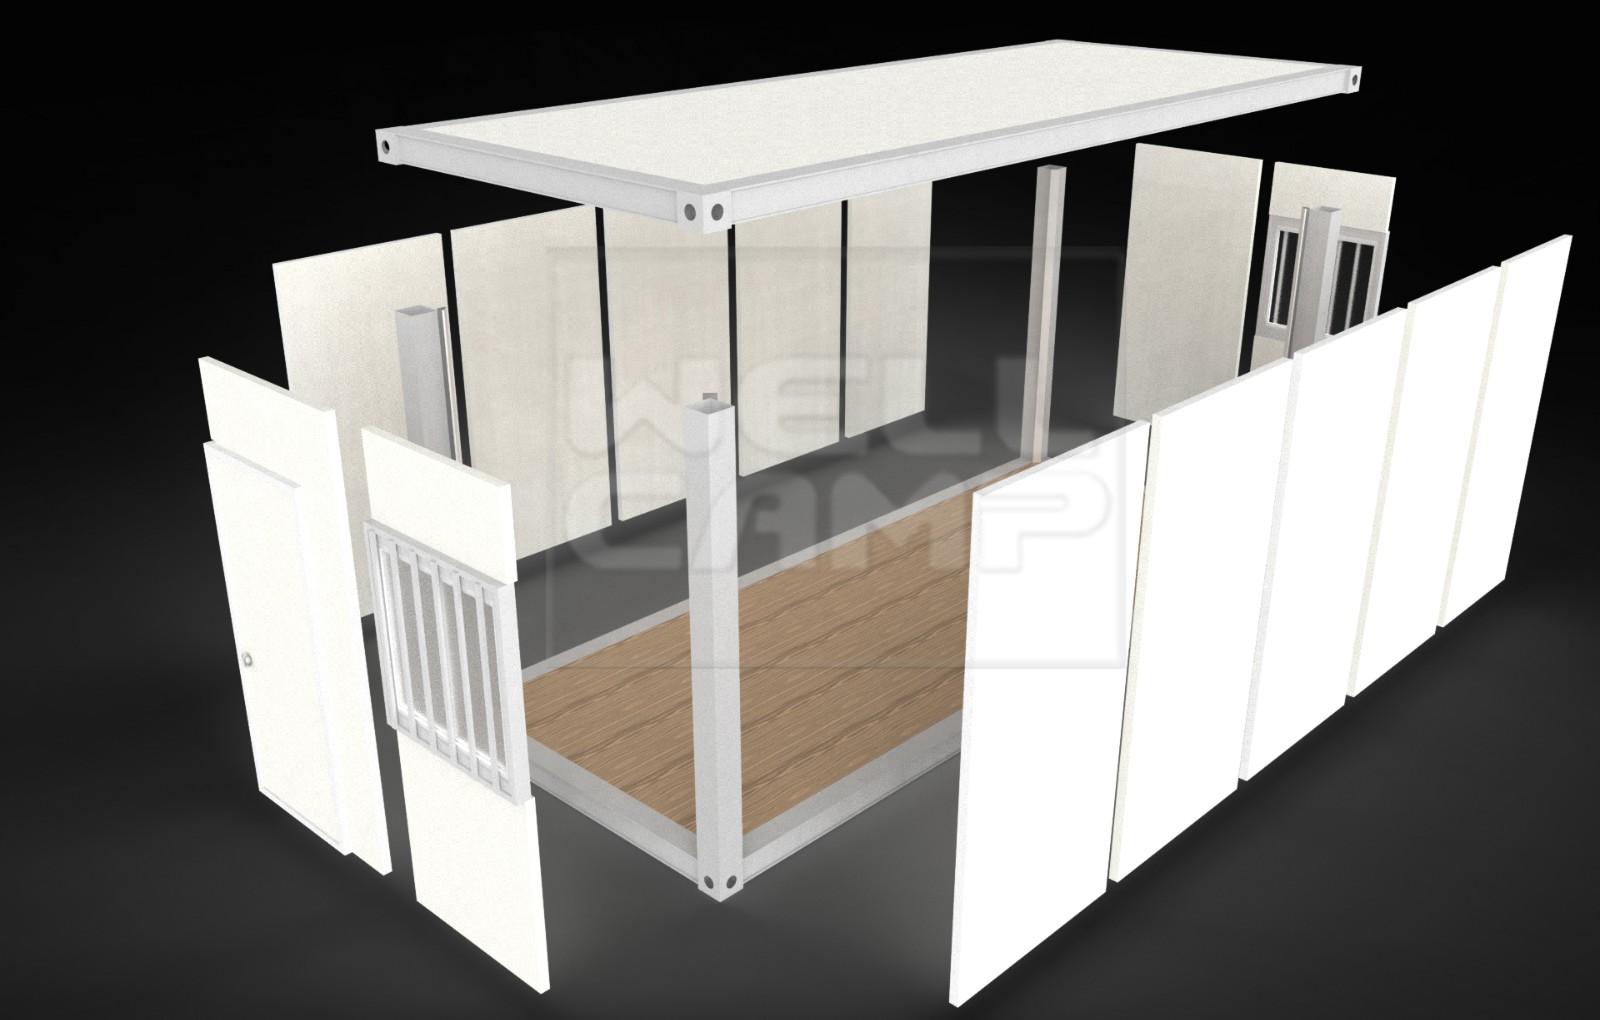 product-Portable Mobile Tiny Casa Modulates Prefabricadas Office Container Building-WELLCAMP, WELLCA